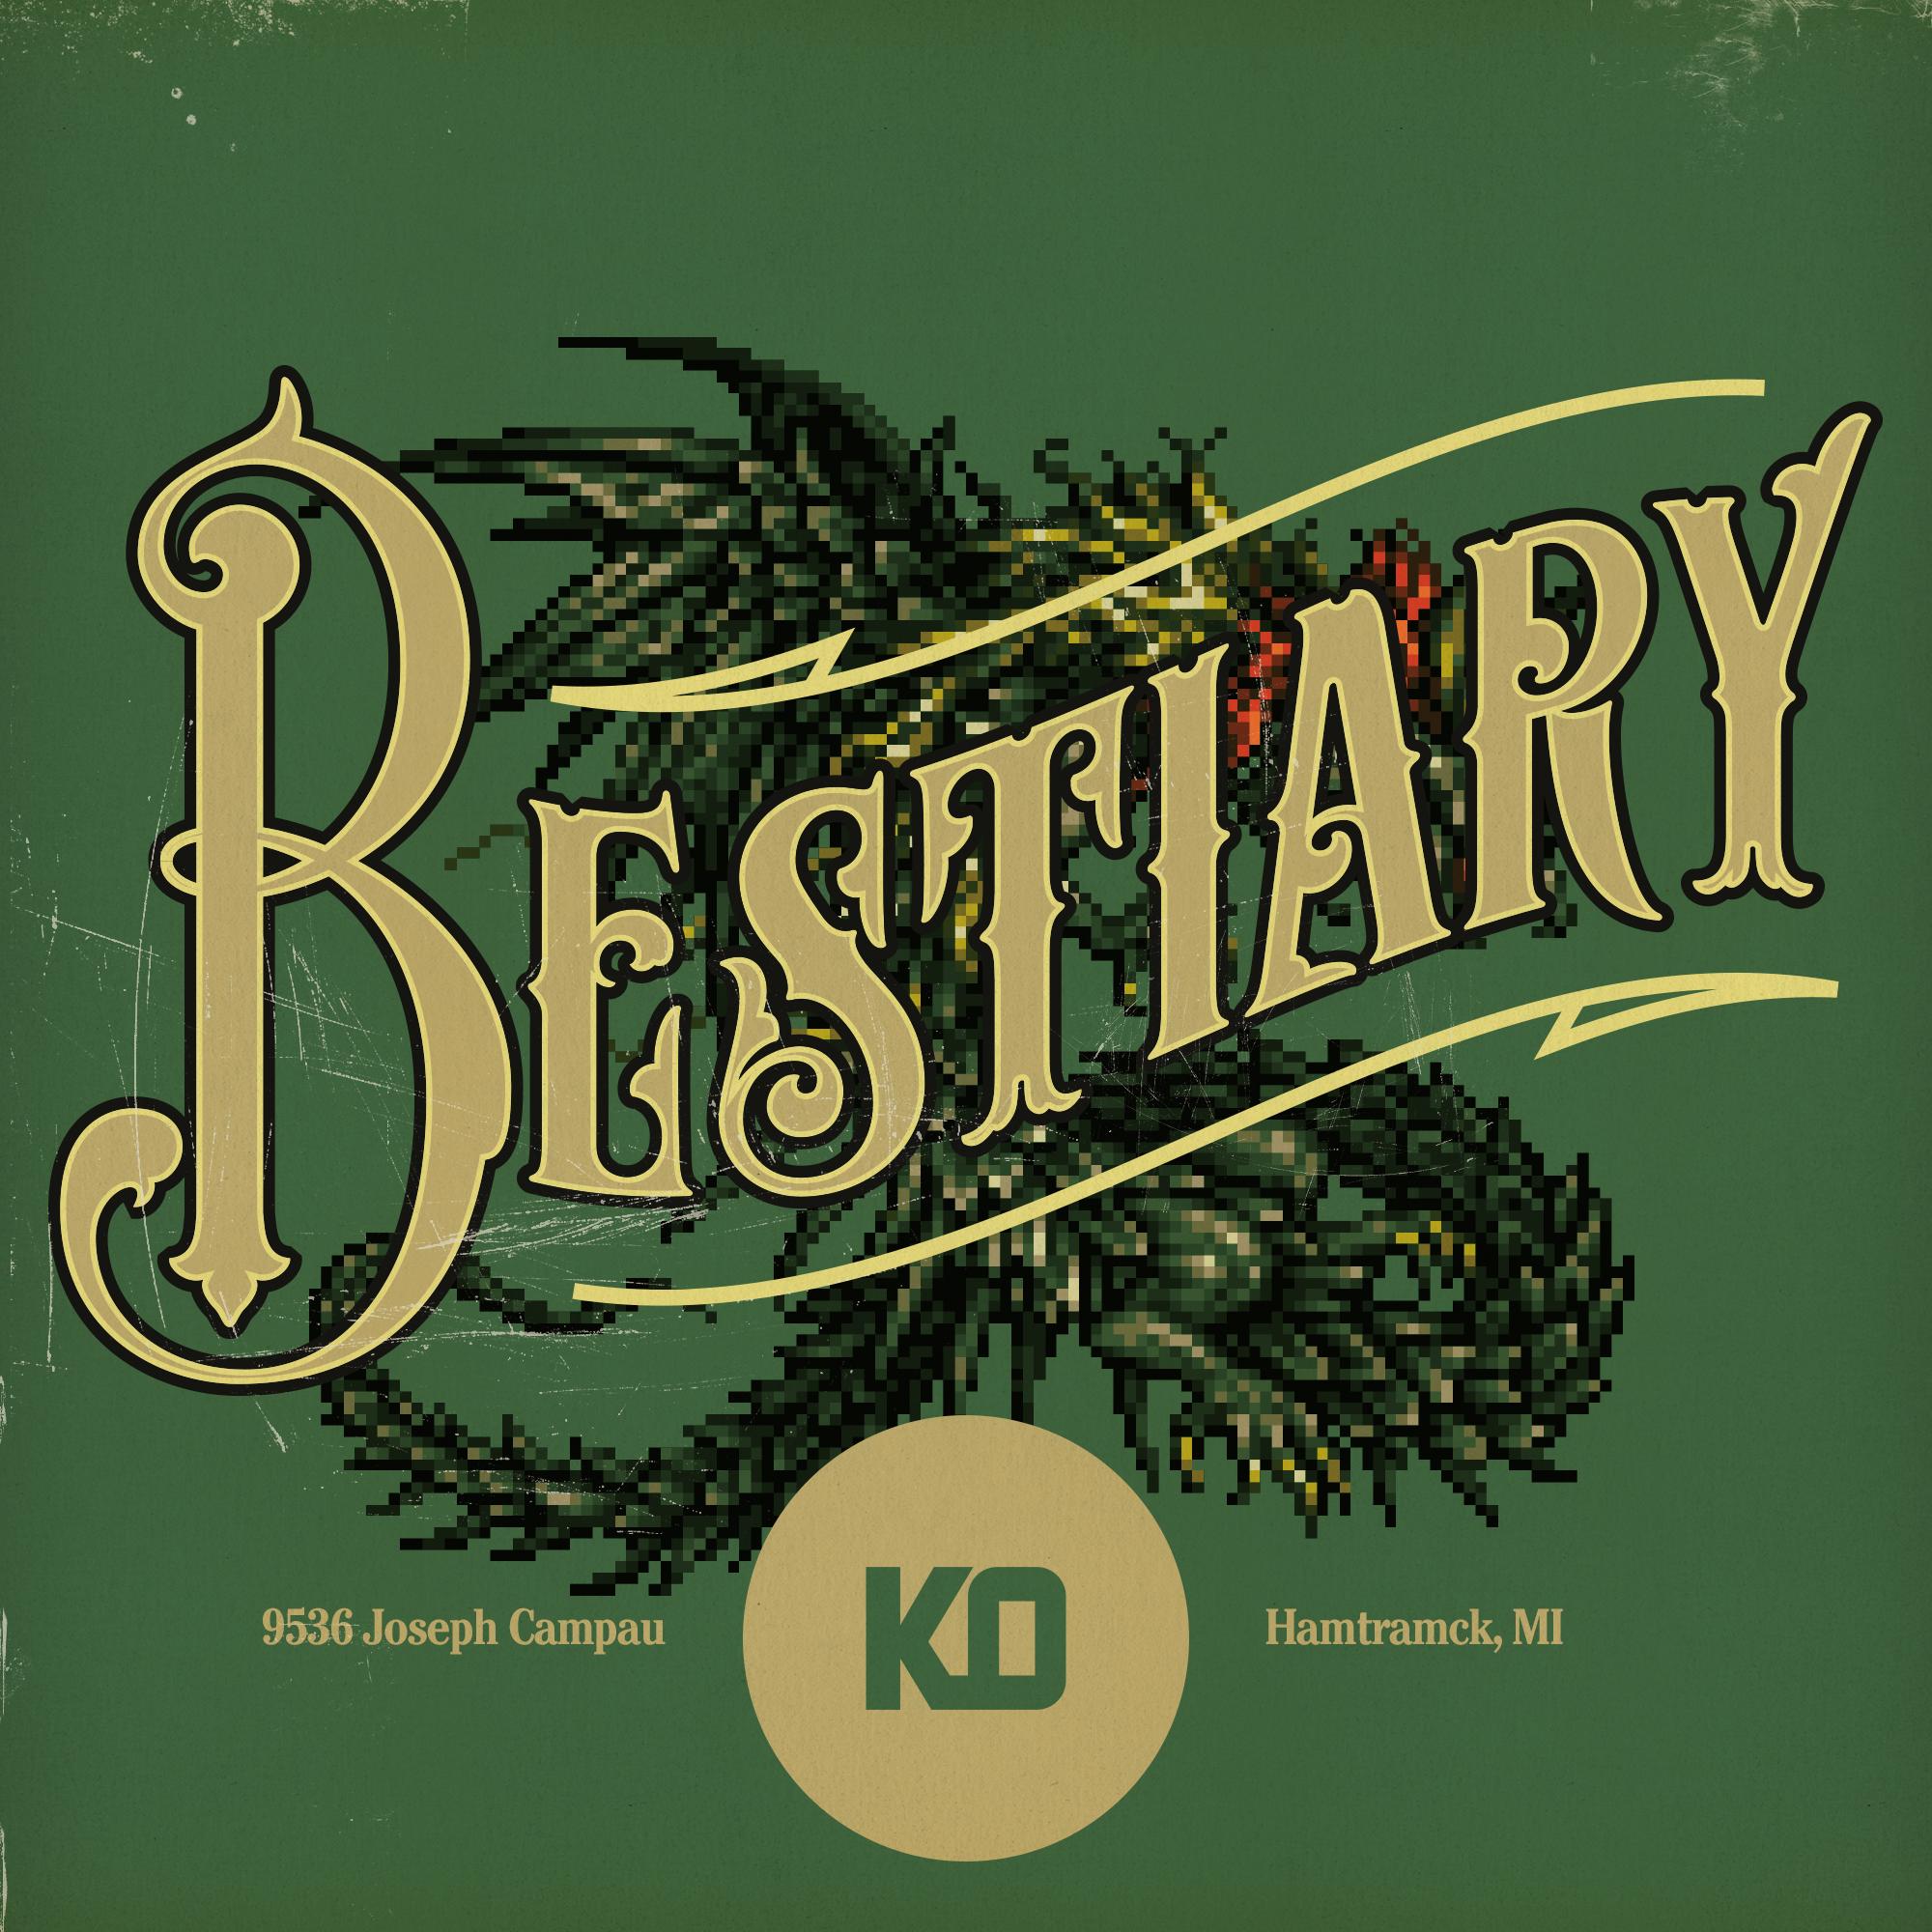 DAC_Bestiary-Instagram-v3.png